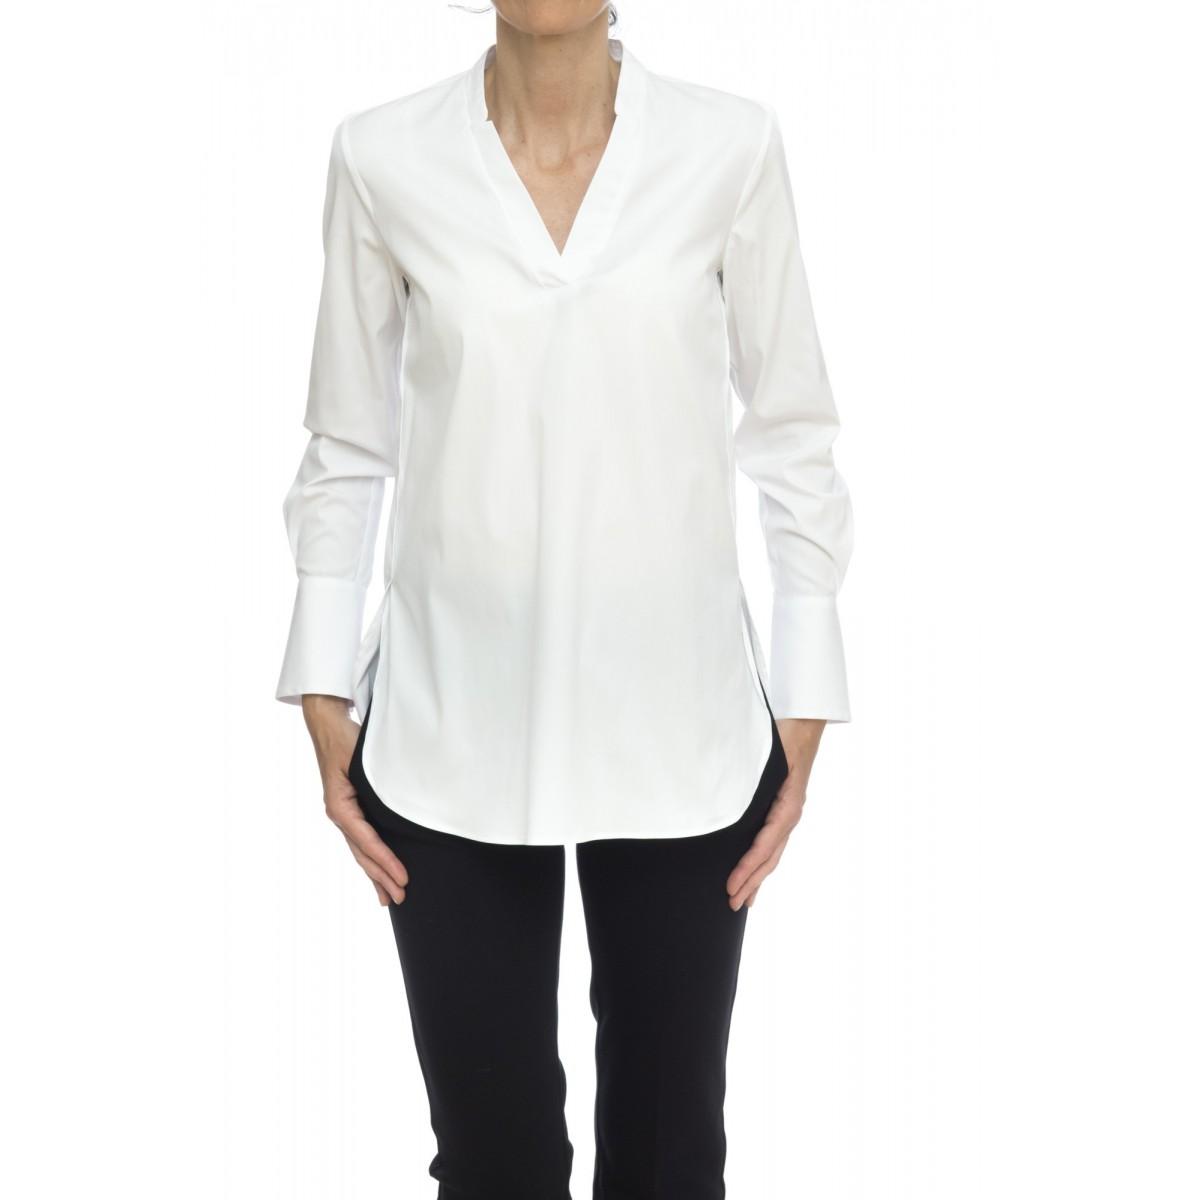 Camicia donna - Luisa 15125